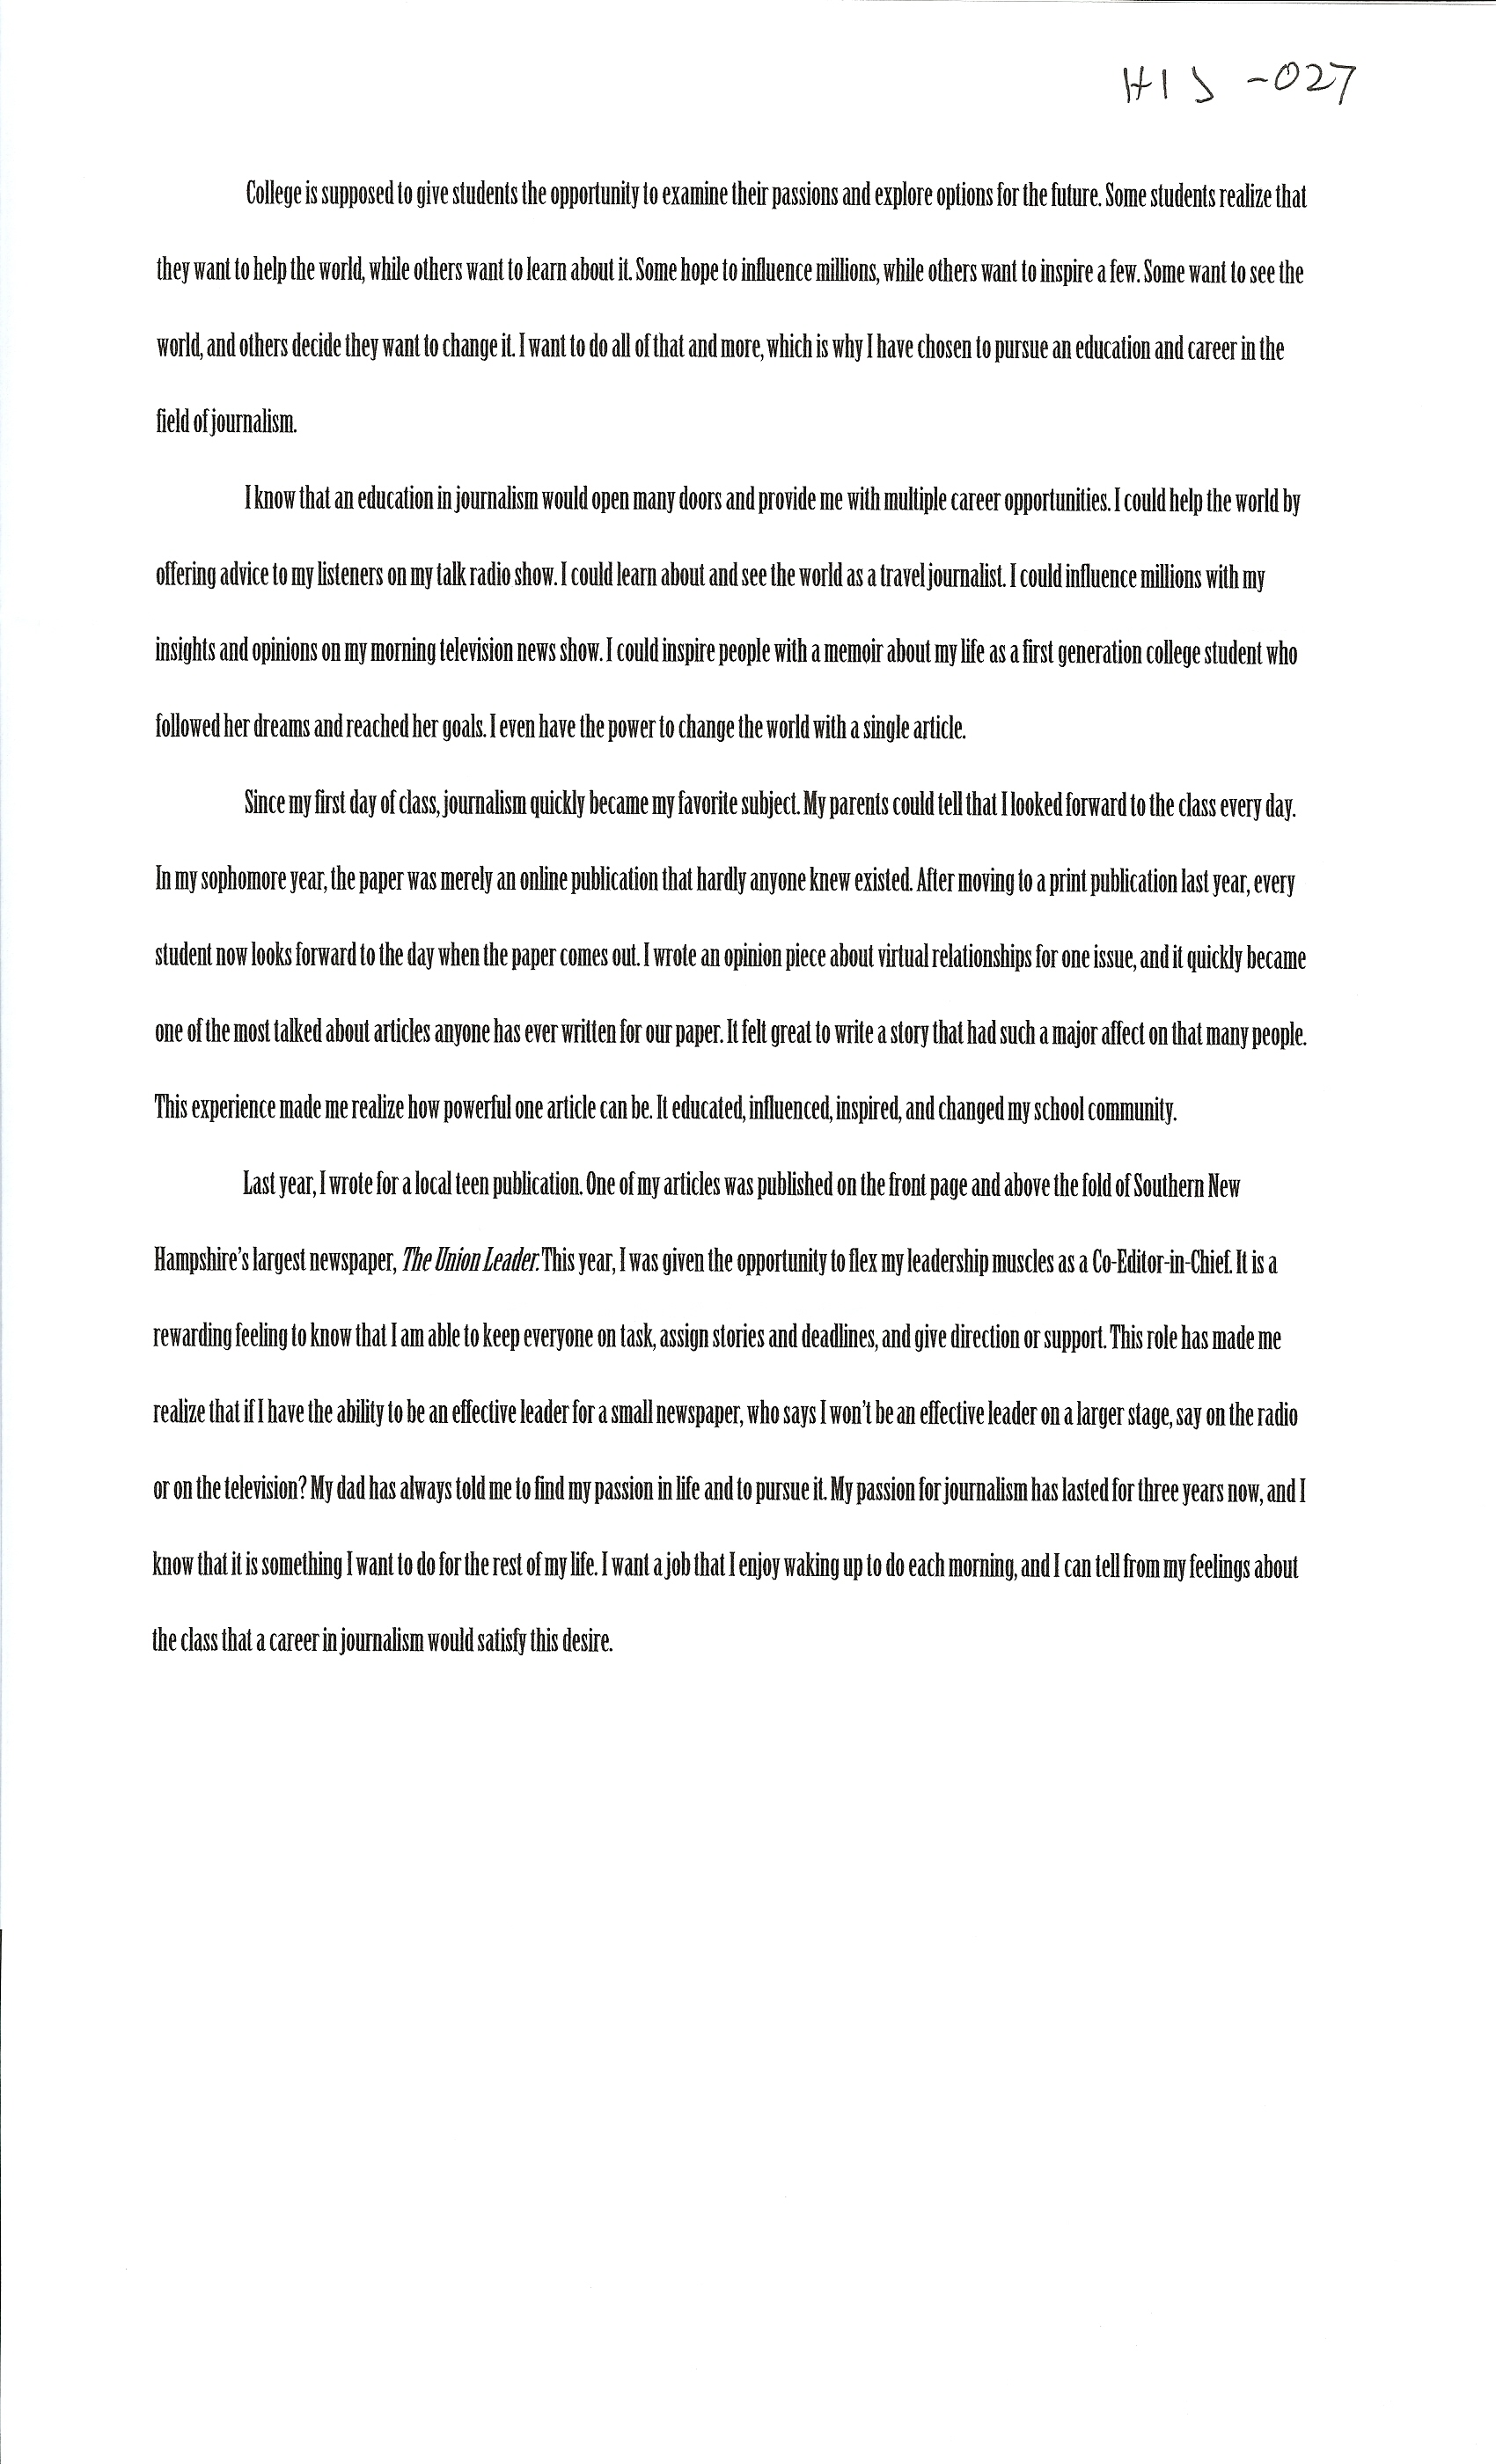 013 Alexa Serrecchia Essays Of Profile Marvelous Examples College Community Company Full